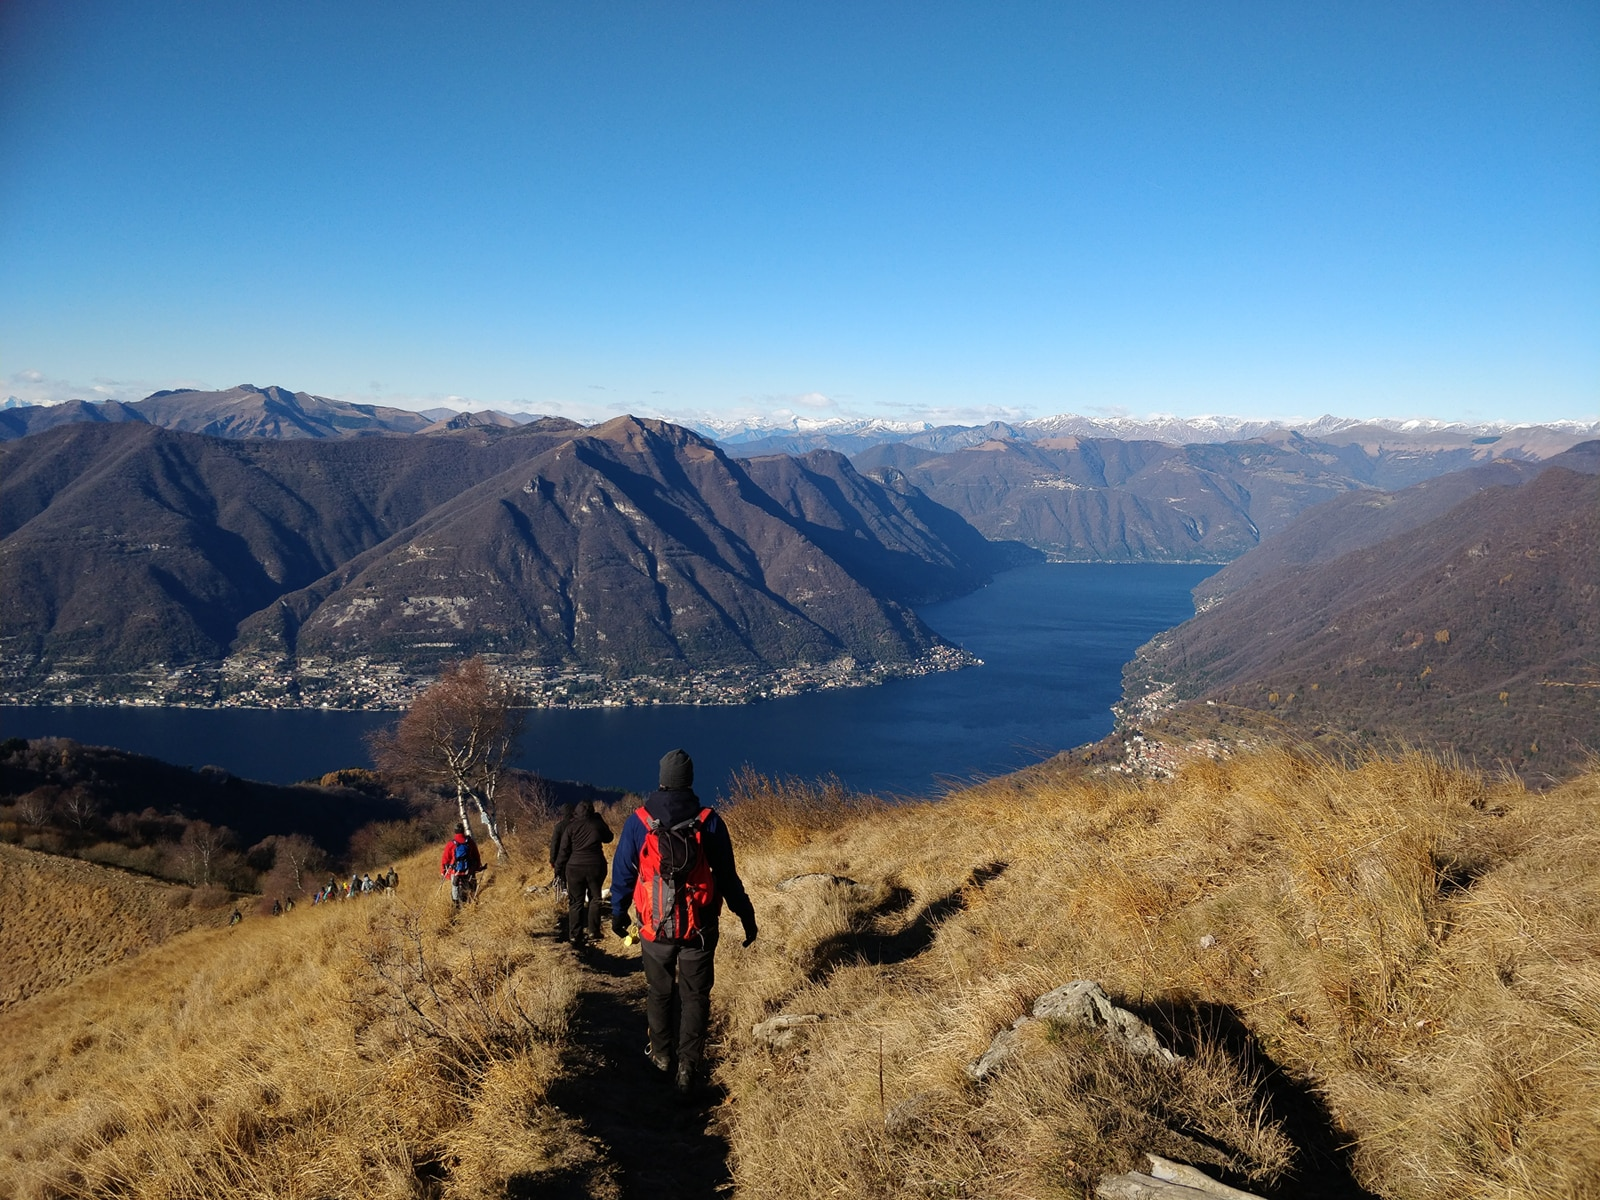 accompagnamento montagna, guide alpine, aigae, guide ambientali